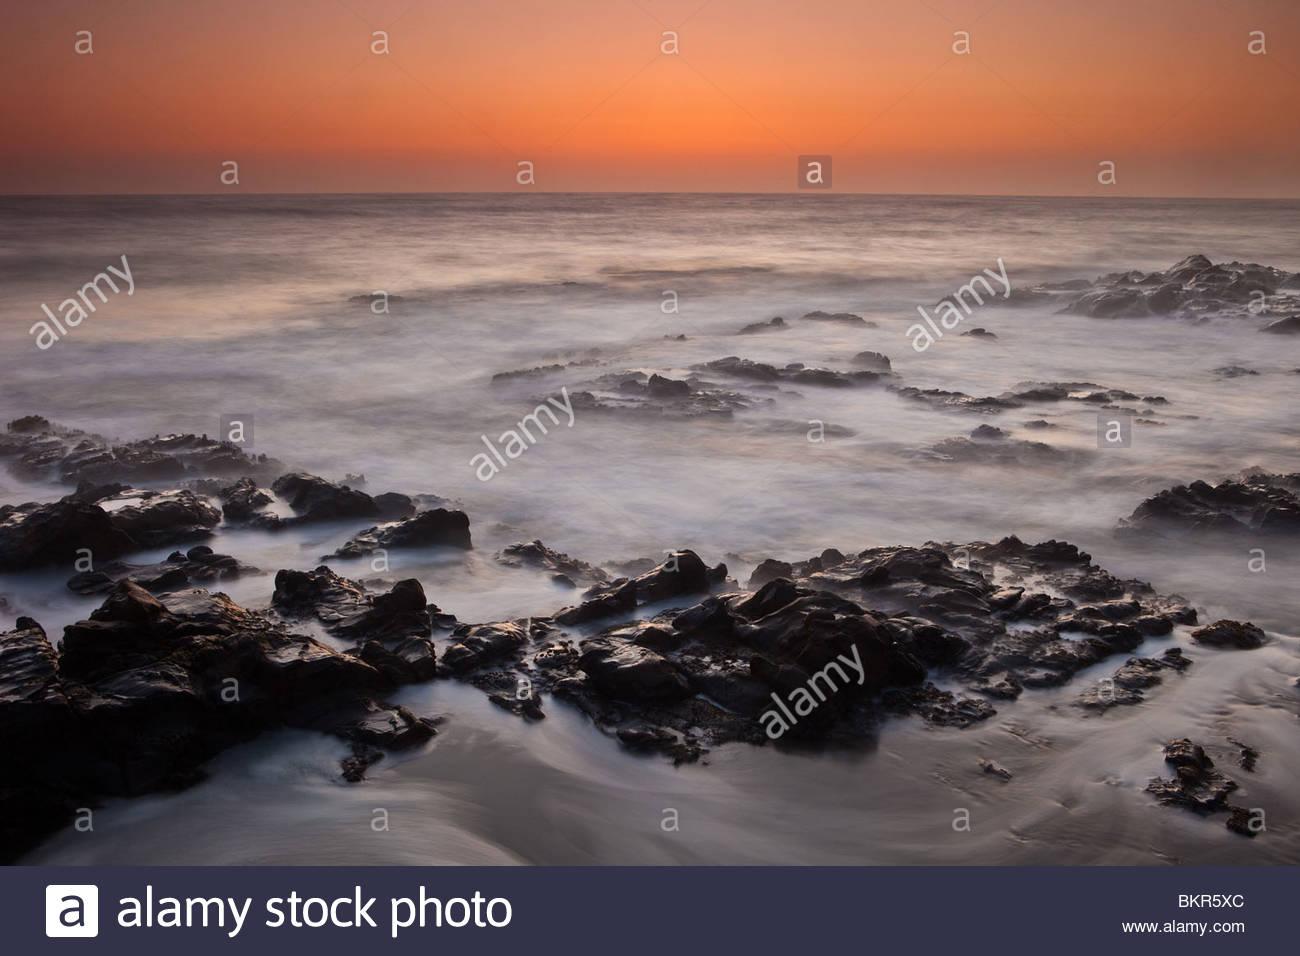 Colorful skies and twilight surf north of Santa Cruz on the Californian coast. Stock Photo